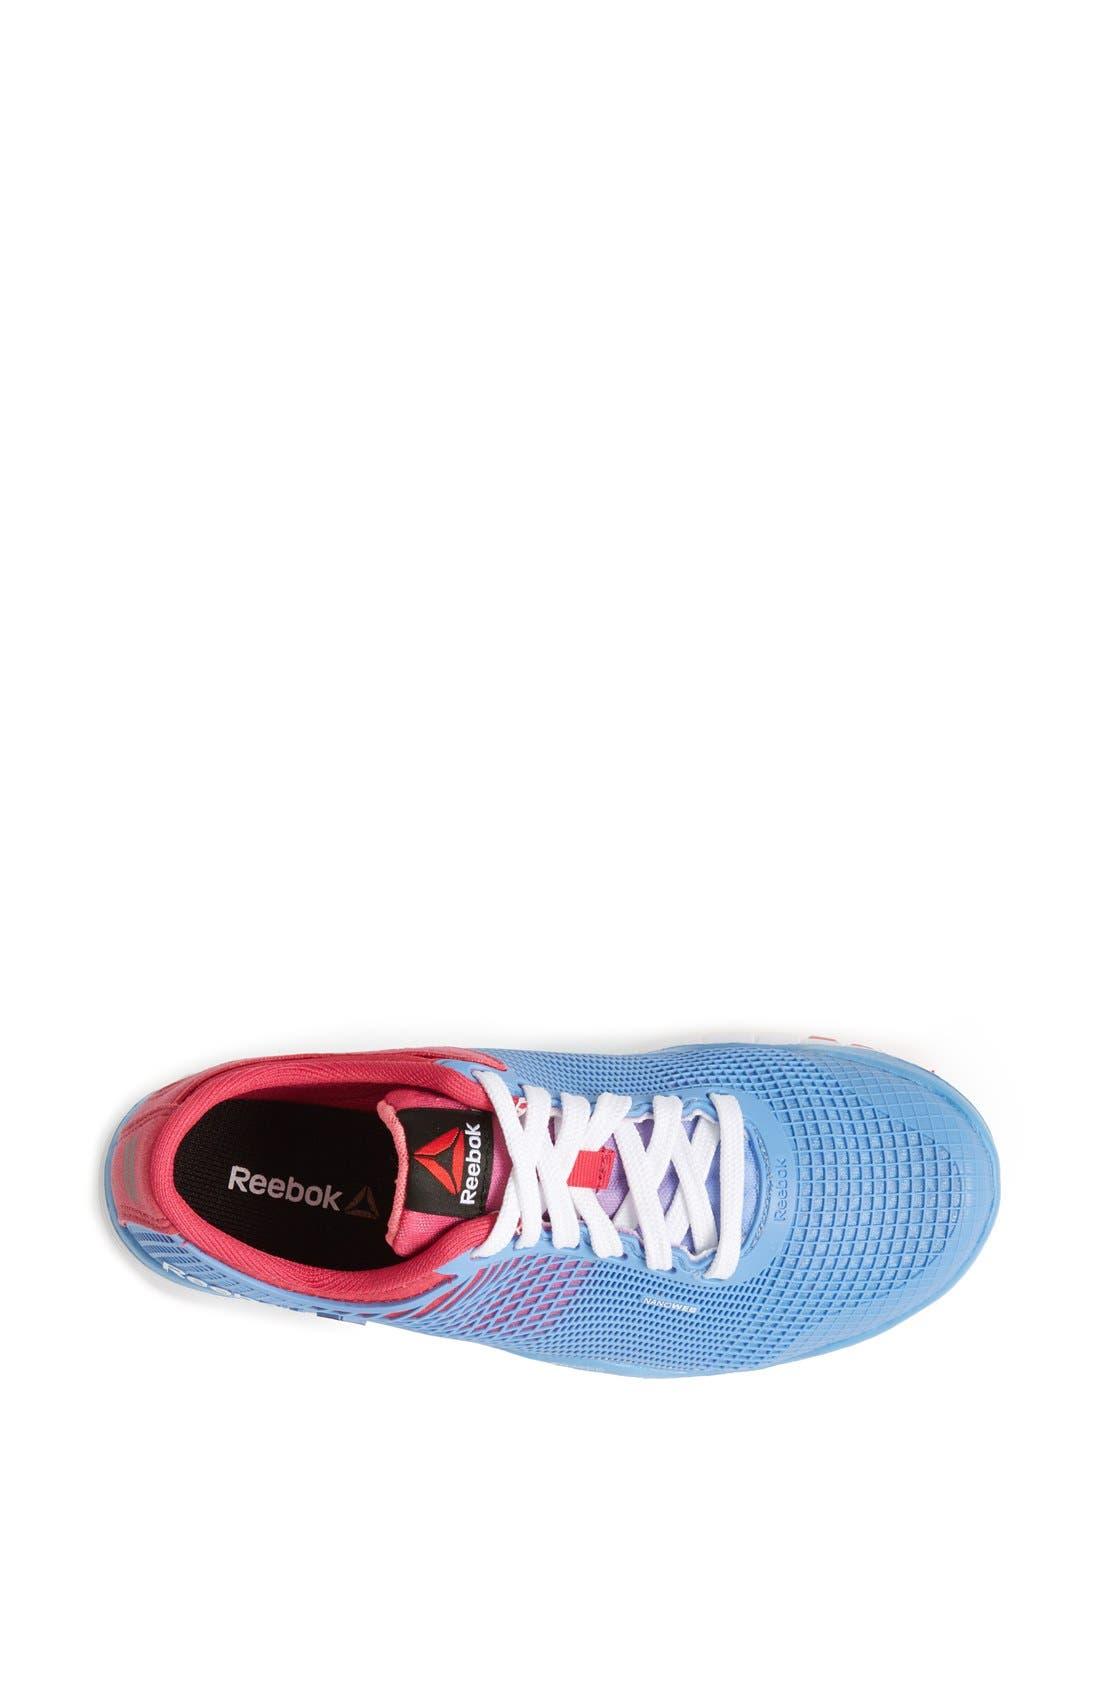 Alternate Image 3  - Reebok 'Quick' Training Shoes (Women)